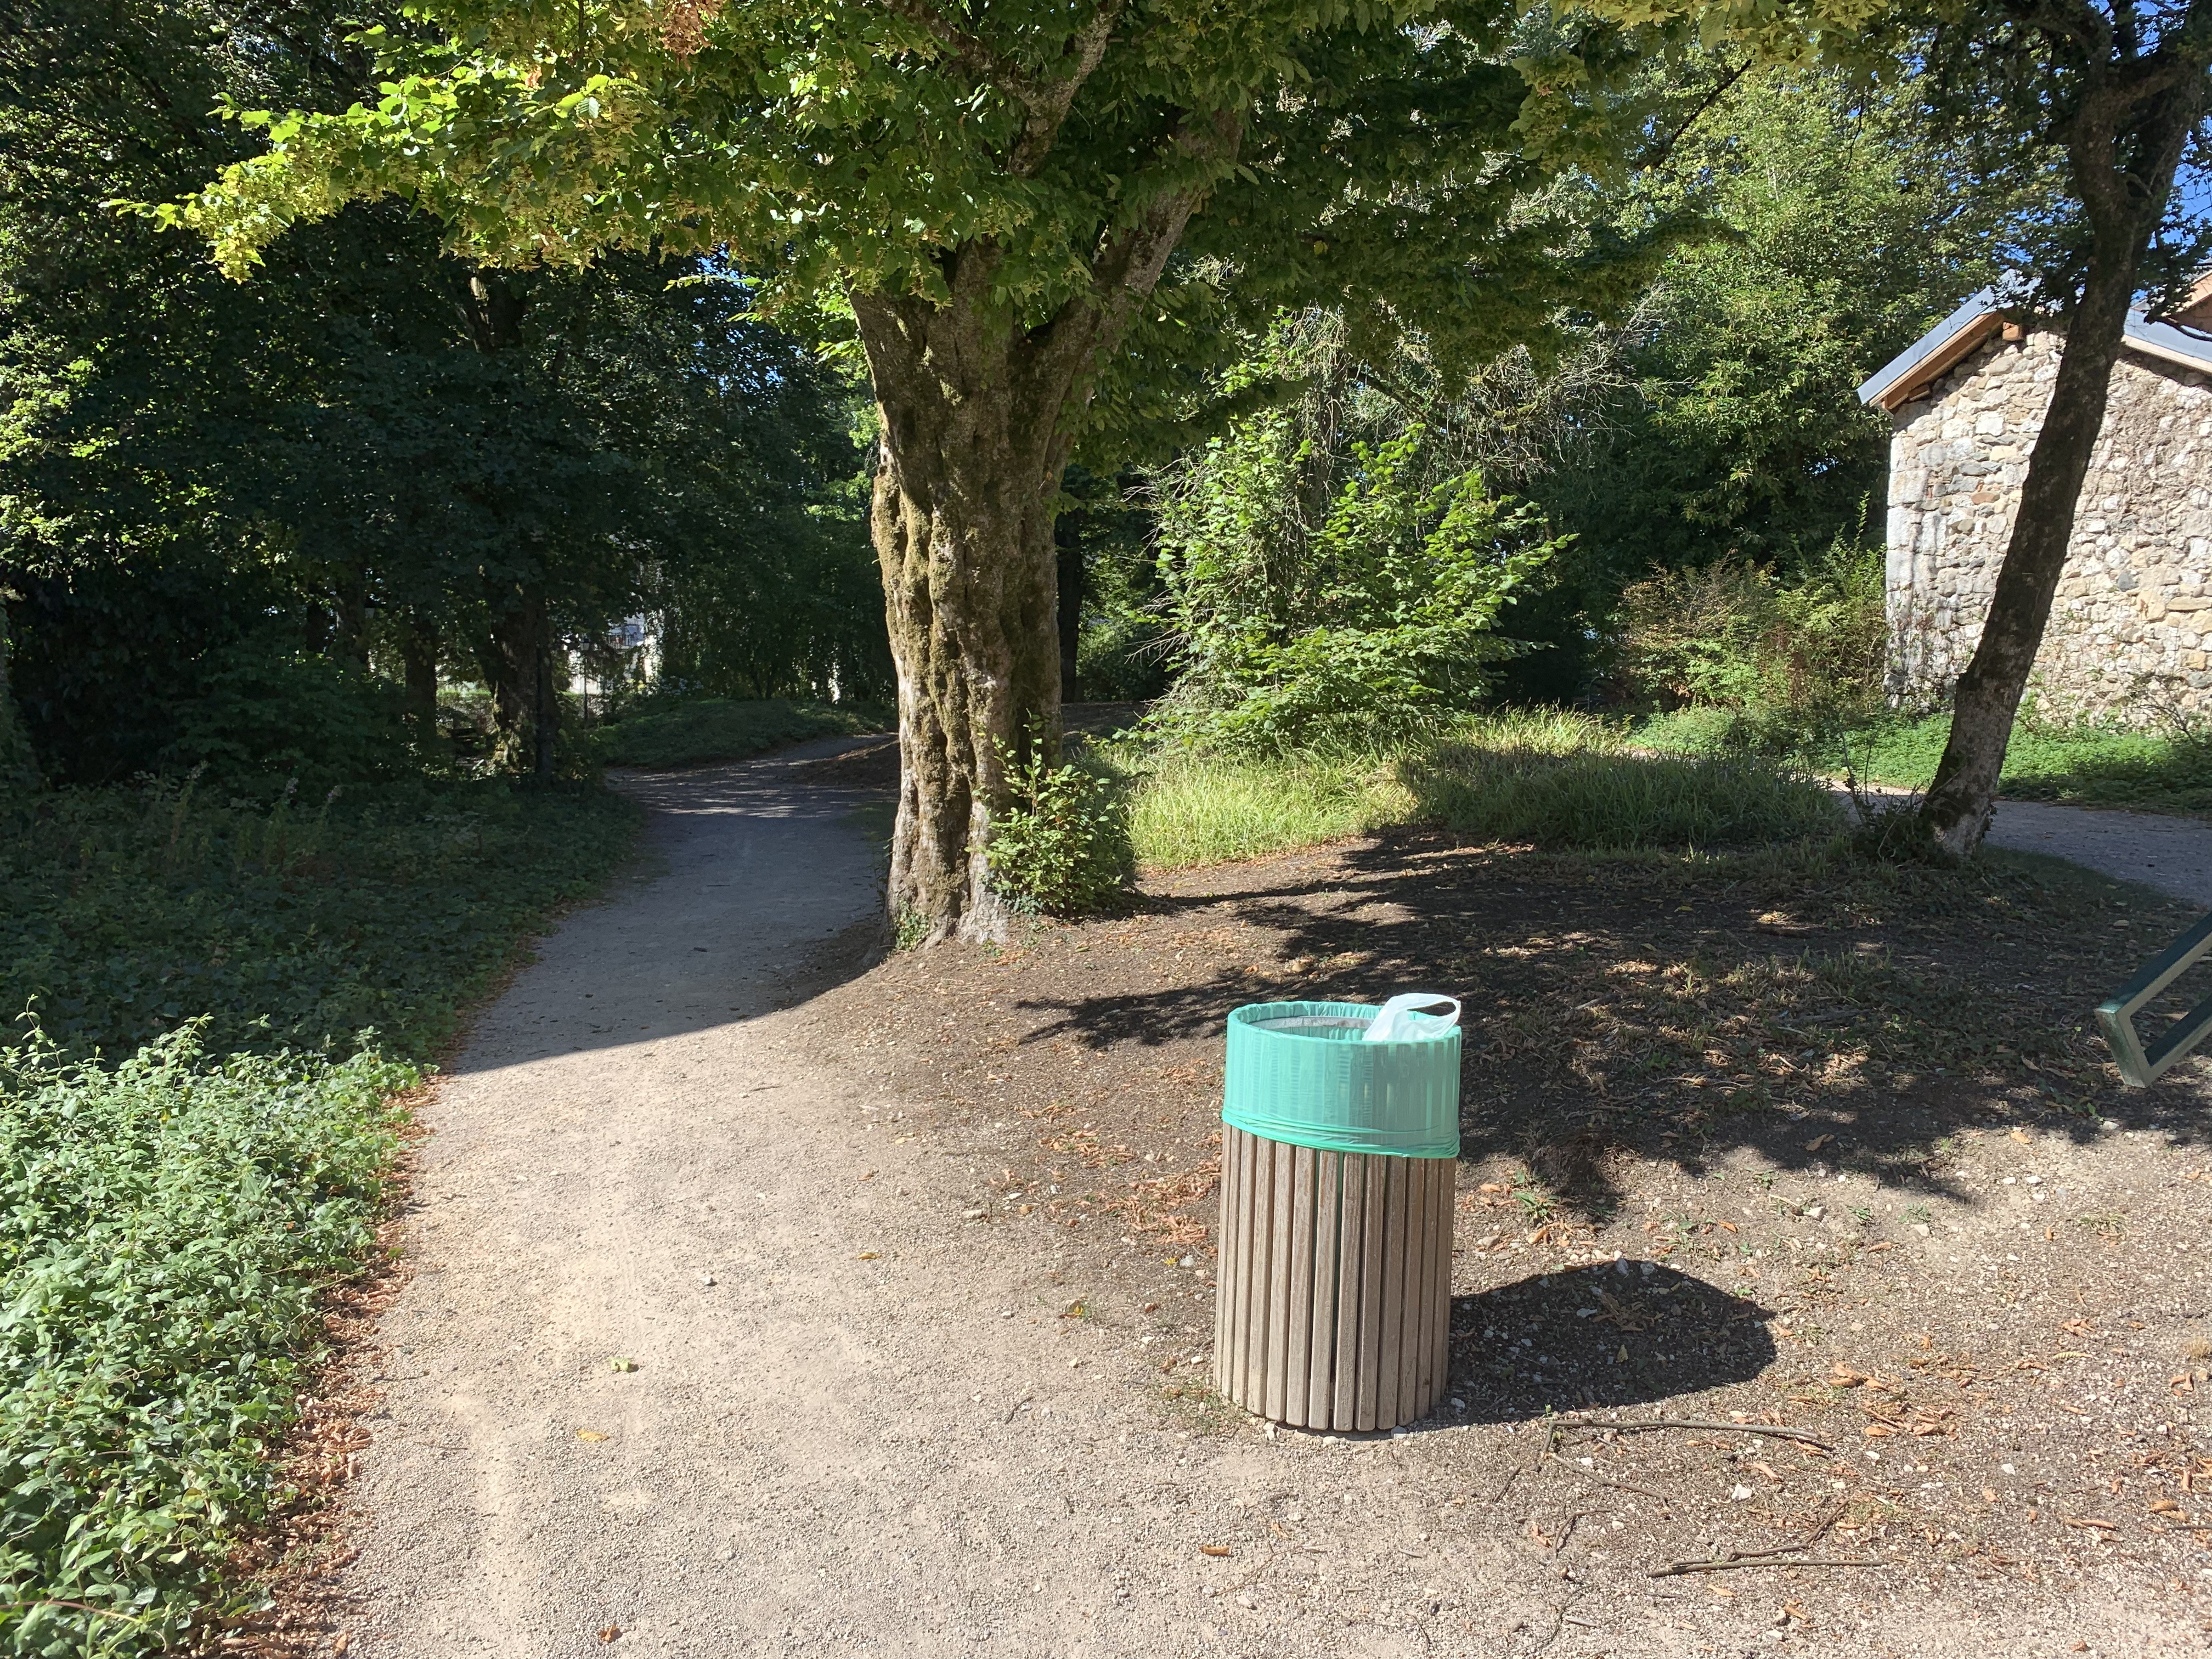 File:une Allée Du Jardin Jean-Pierre Camus (Belley).jpg ... à Allee De Jardin